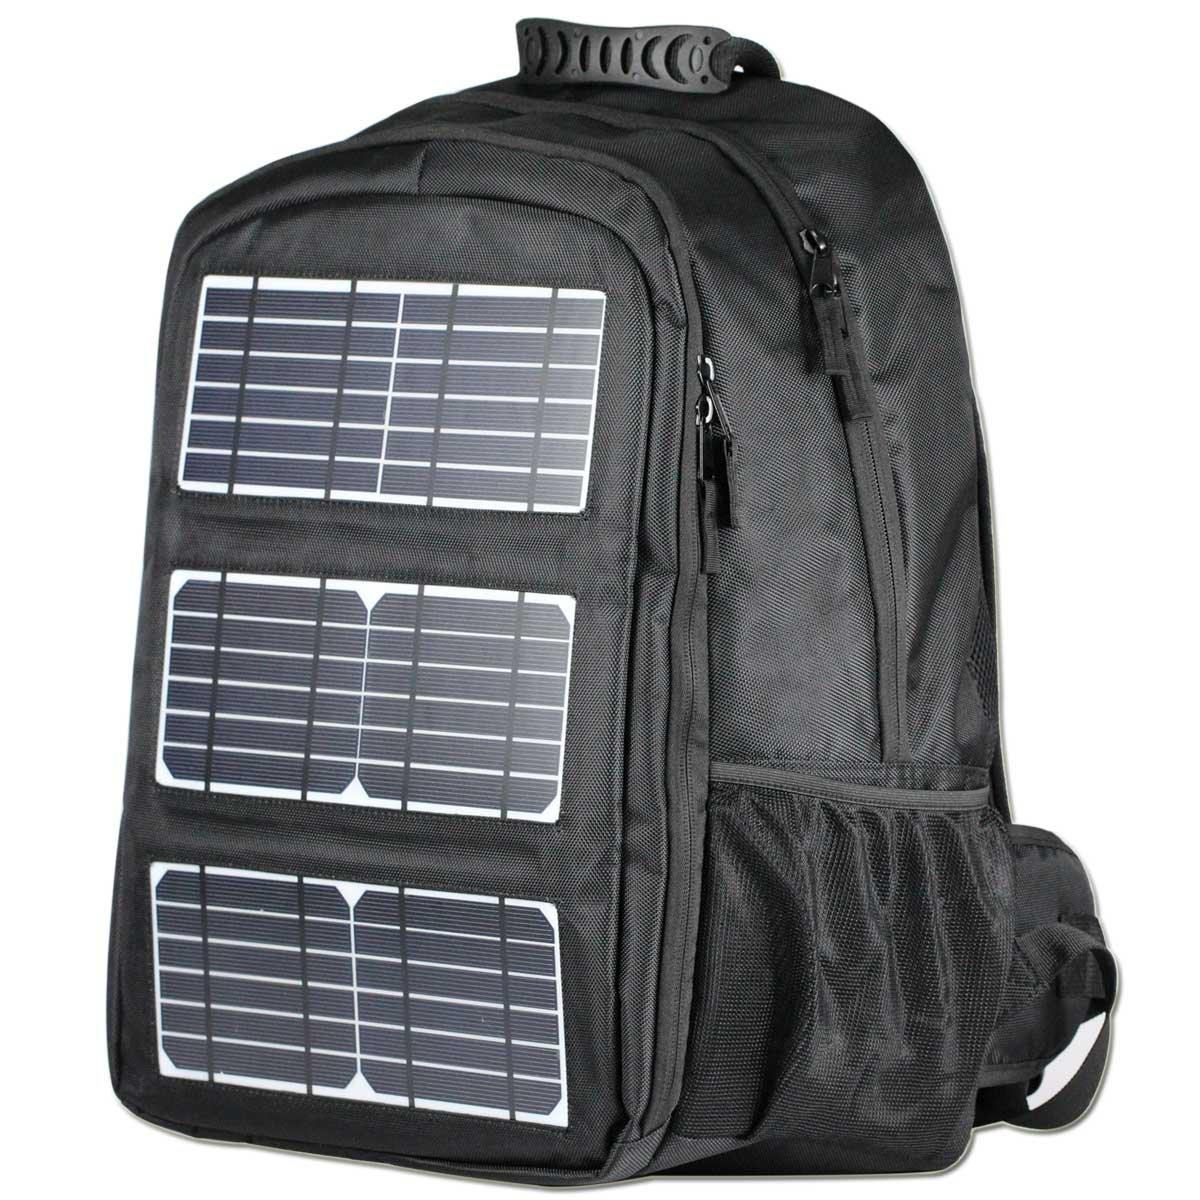 eceen solarbetrieben Rucksack Pack Sonne geladen Wandern Rucksack ...